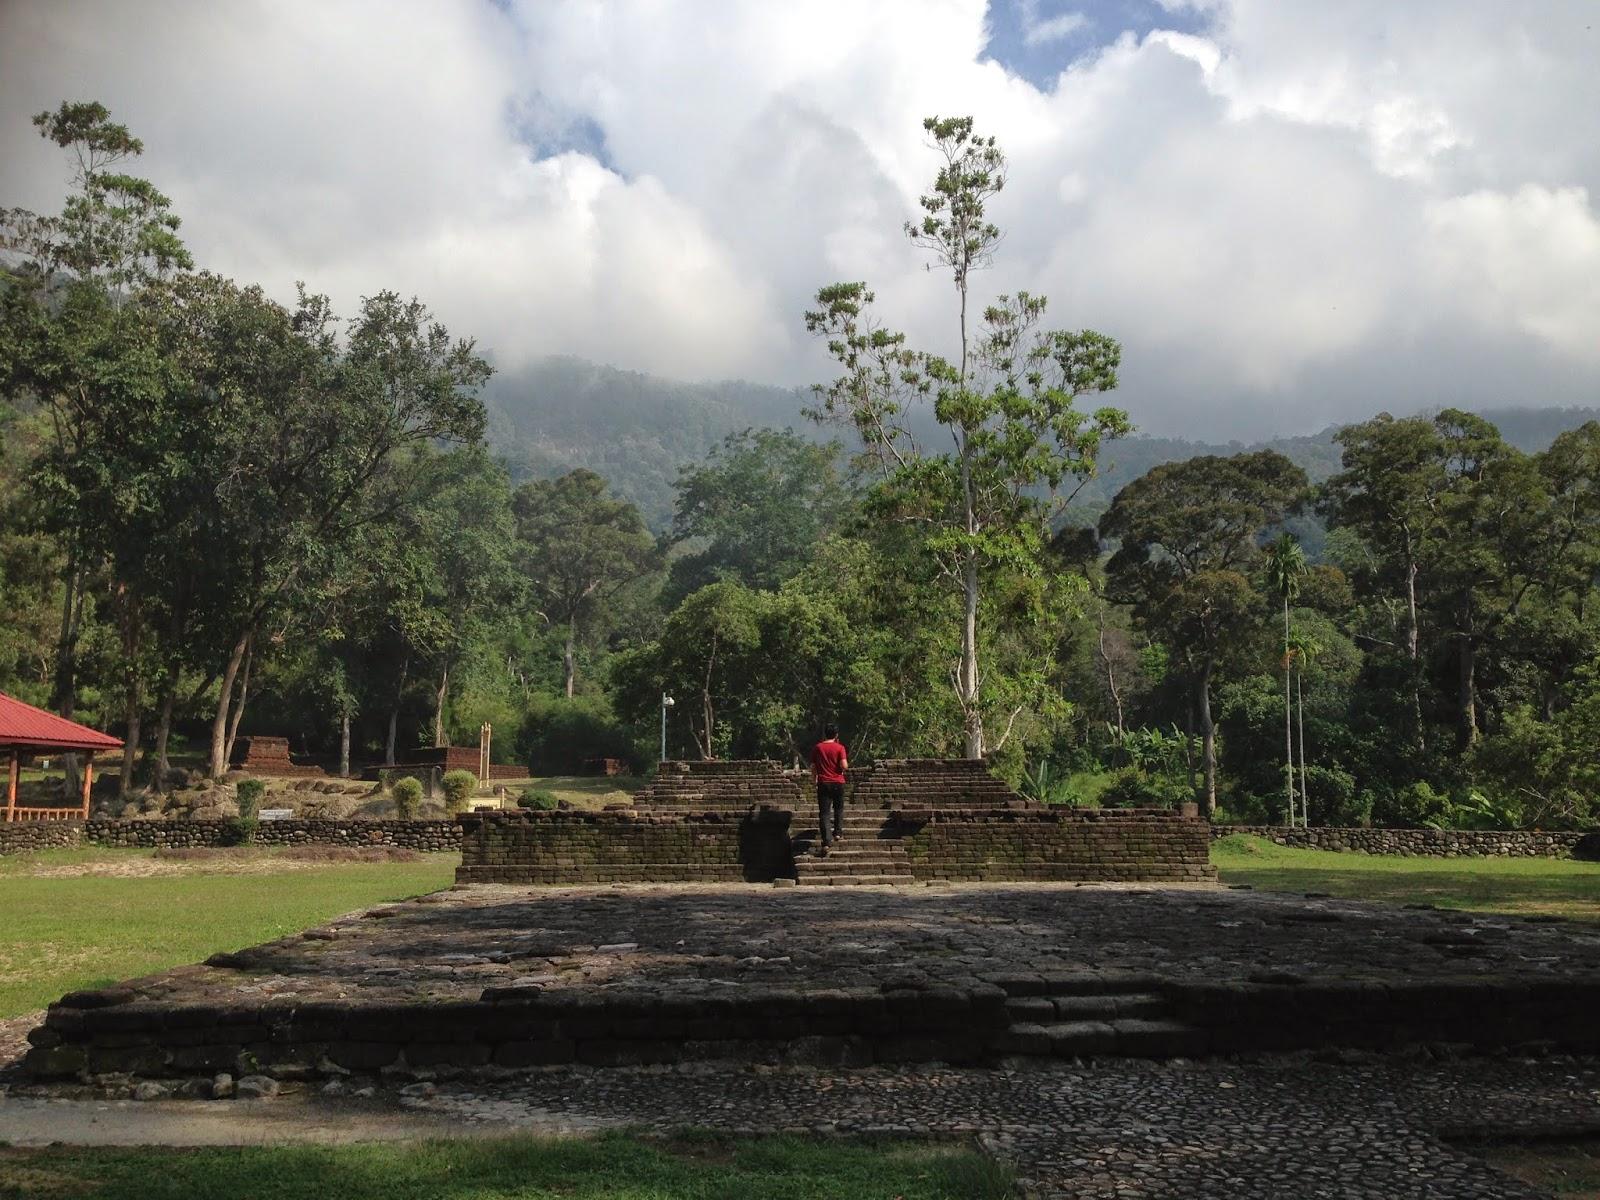 Lembah Bujang Archaeological Museum